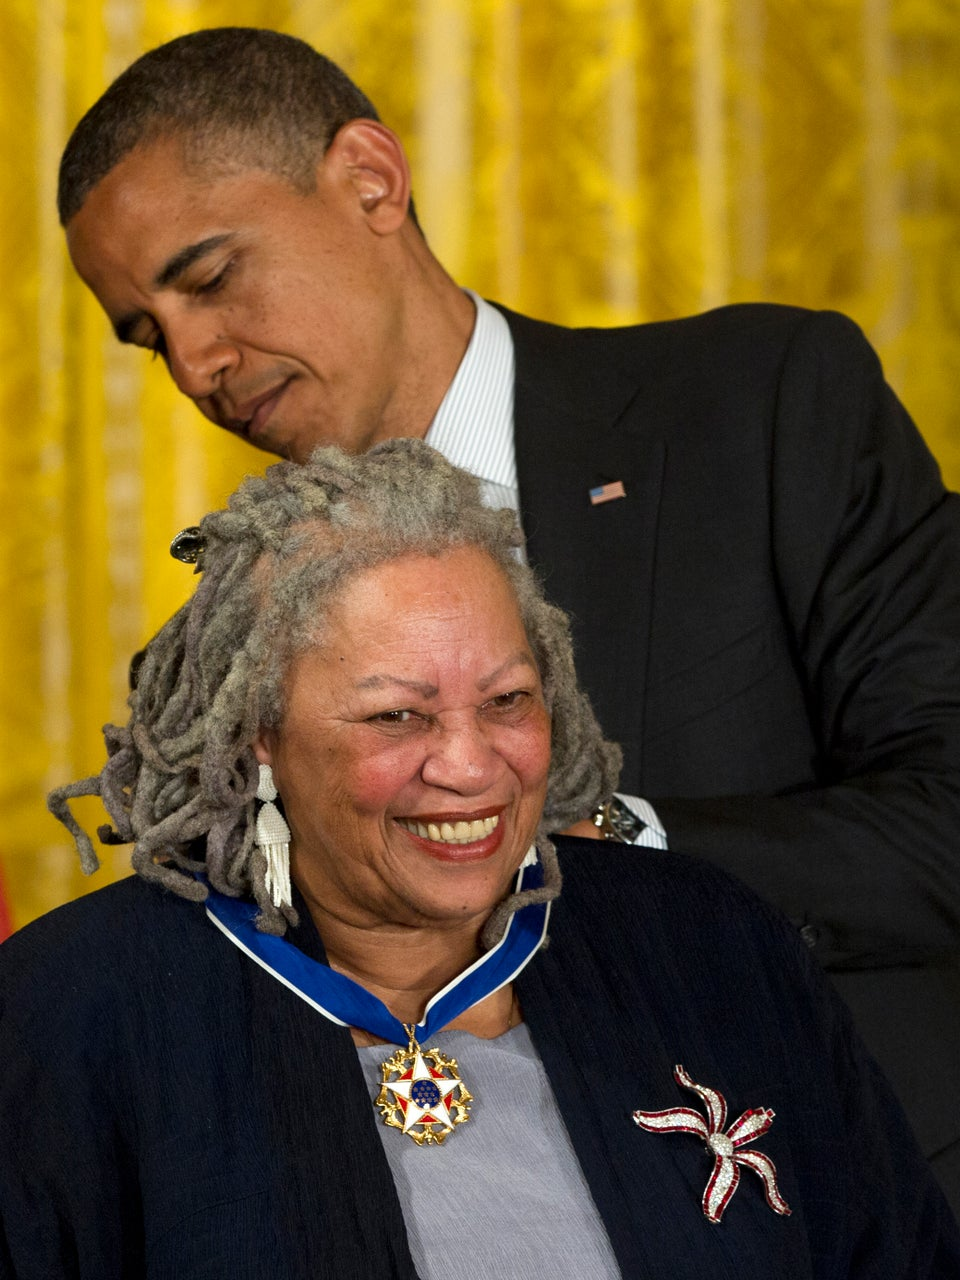 Coffee Talk: Toni Morrison Receives Medal of Freedom Award